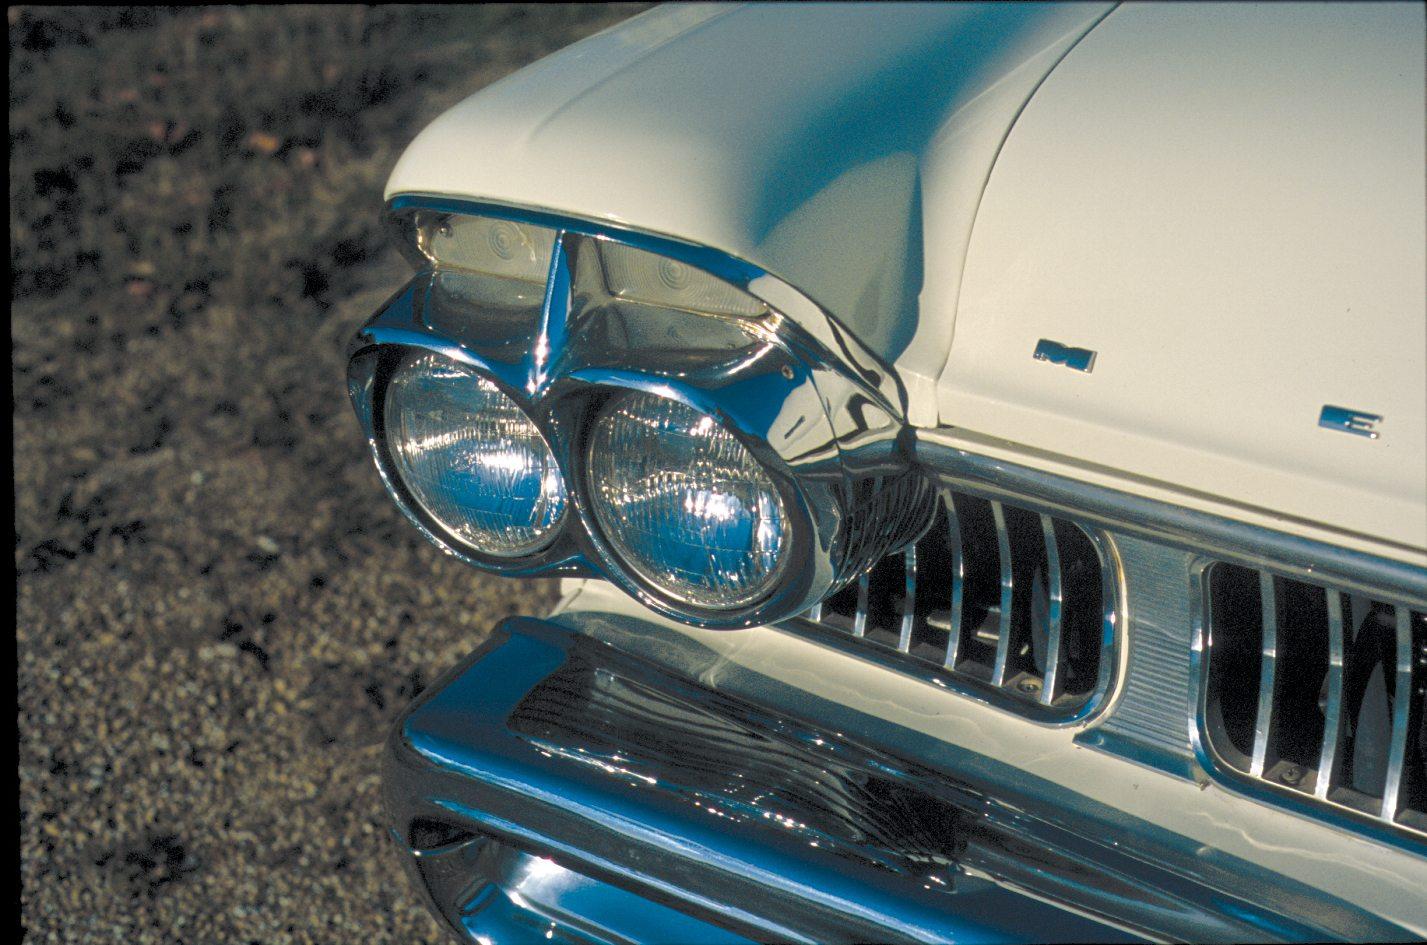 1957 Mercury Colony Park Quadra-Beam Headlights